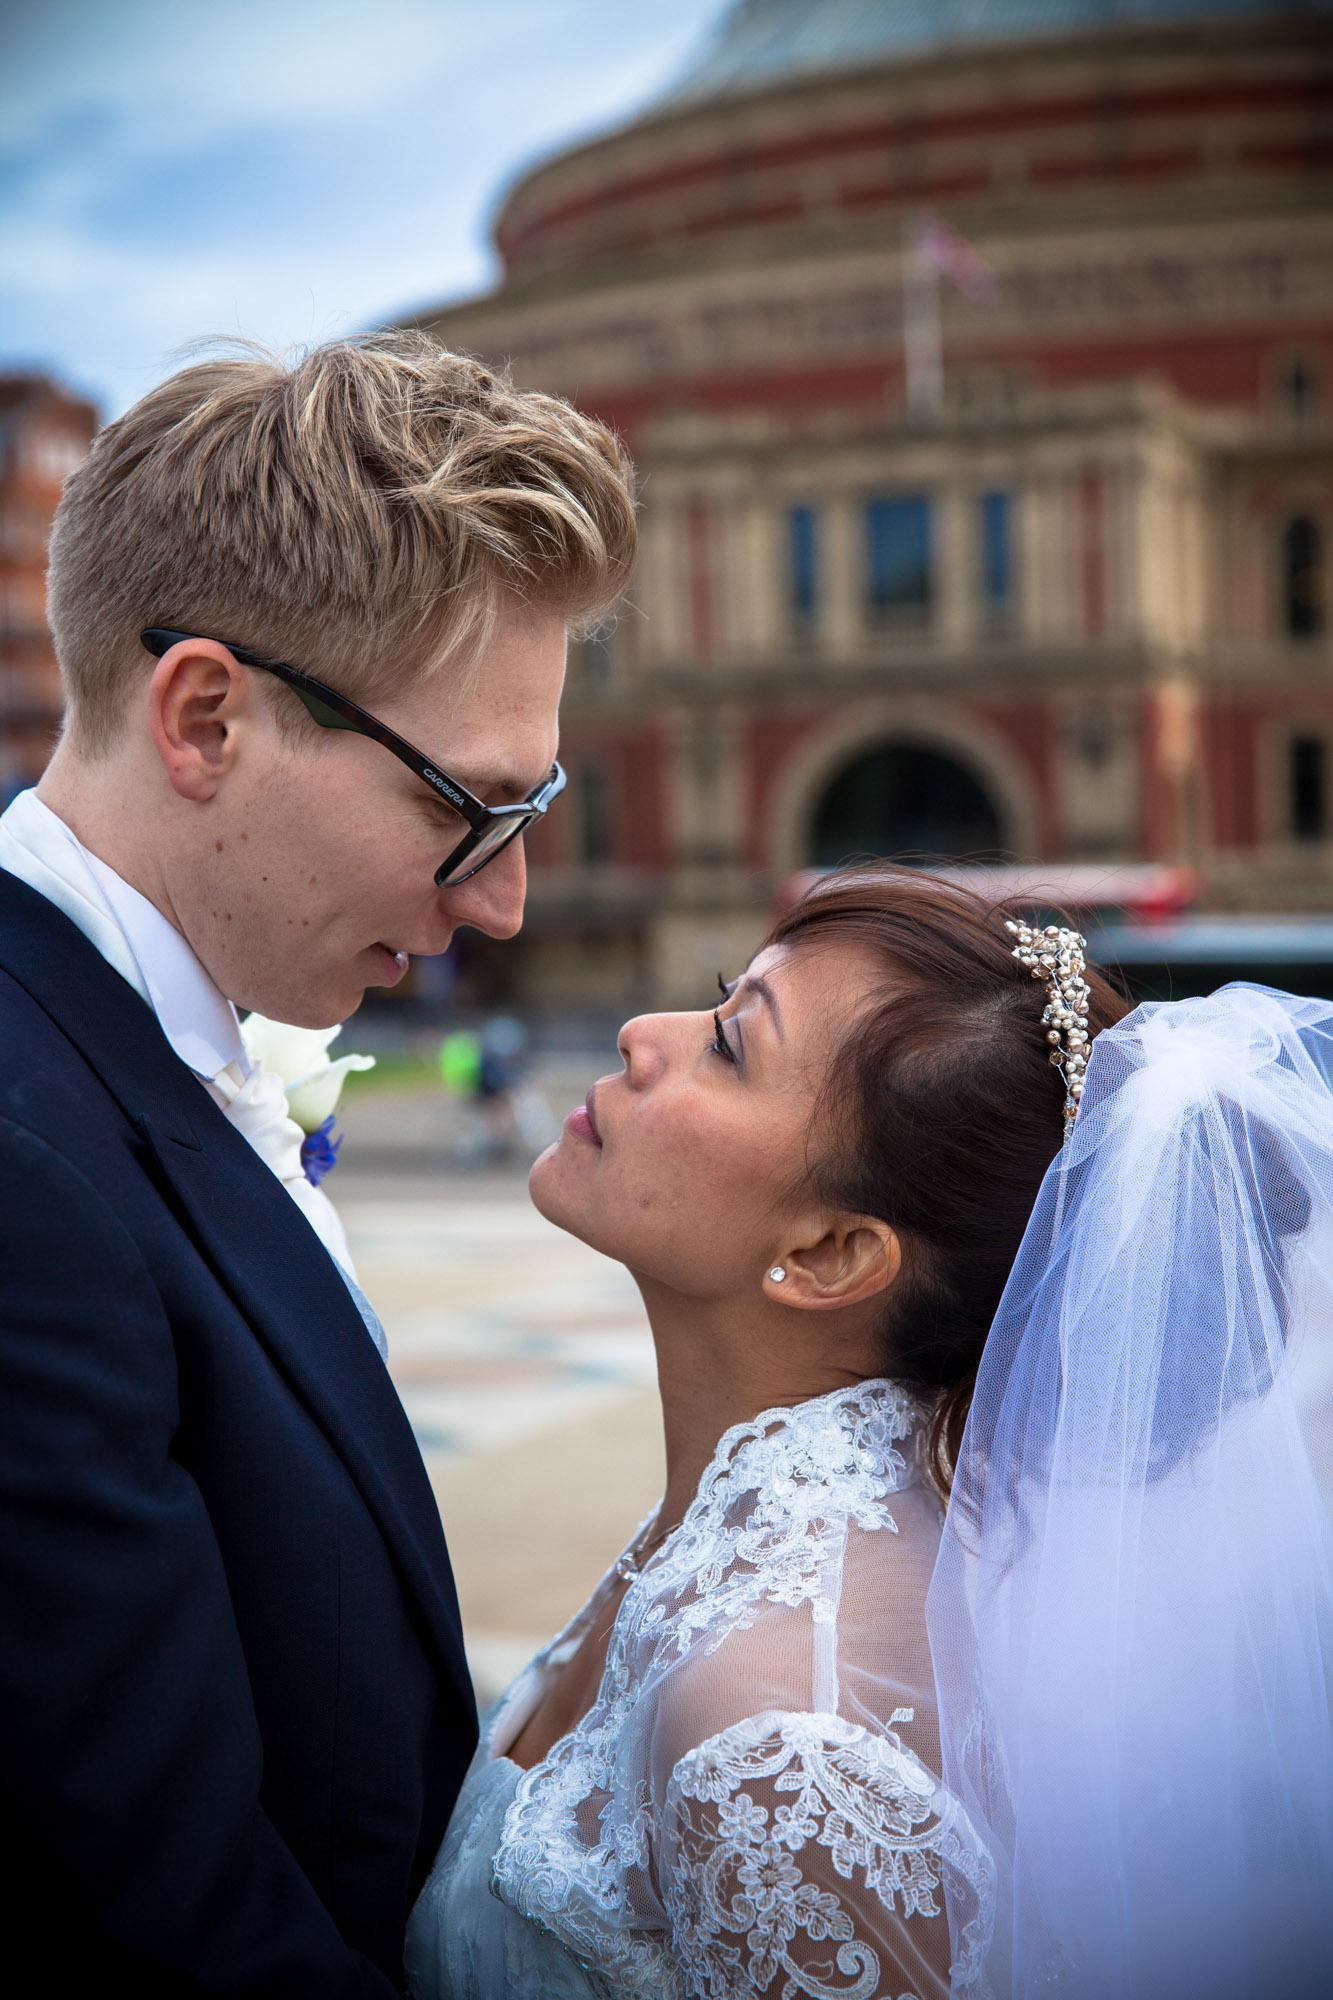 weddings-couples-love-photographer-oxford-london-jonathan-self-photography-70.jpg